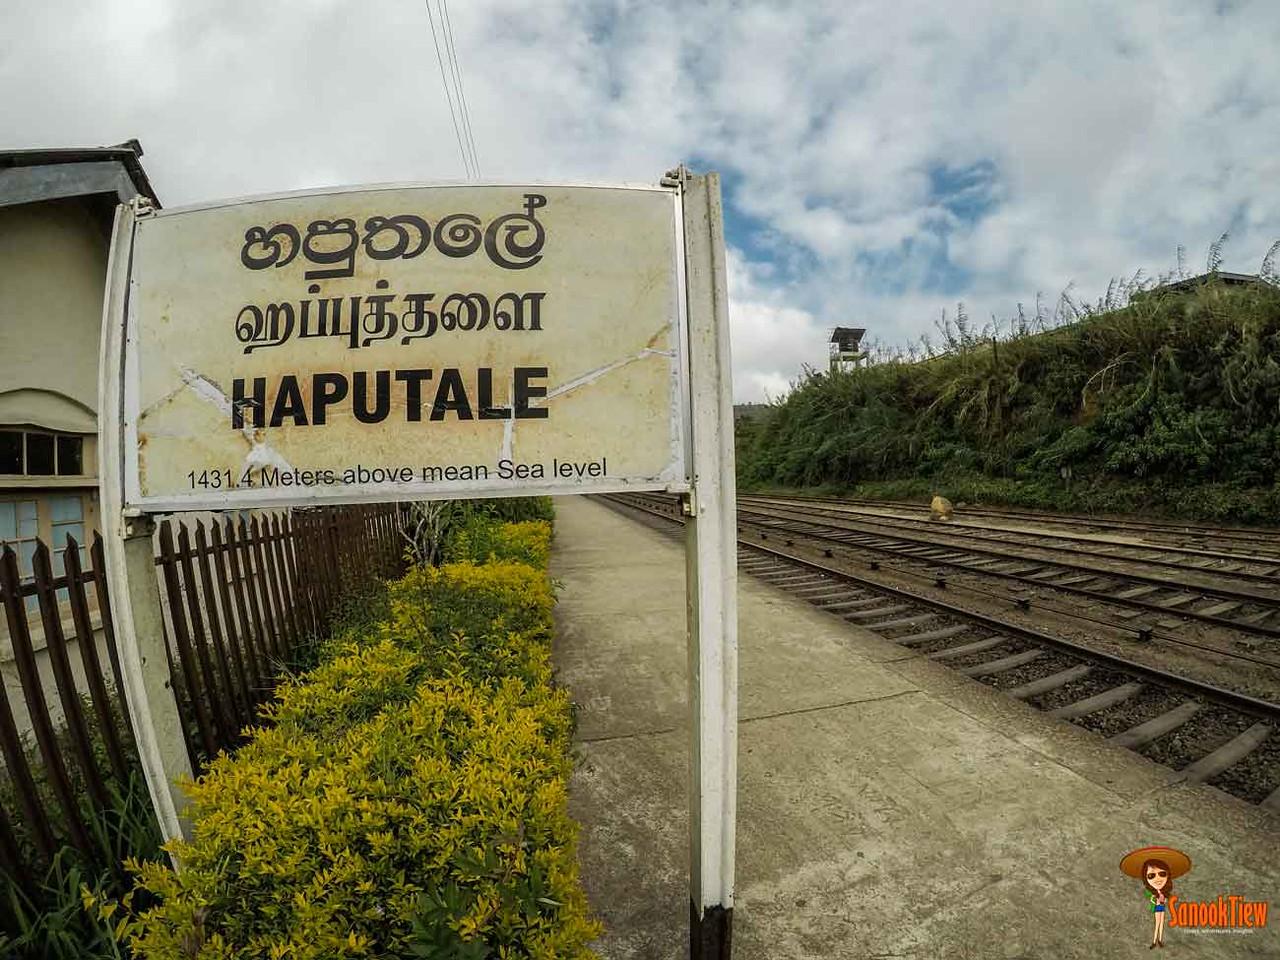 Haputale ฮาปูตาเล Srilanka ศรีลังกา